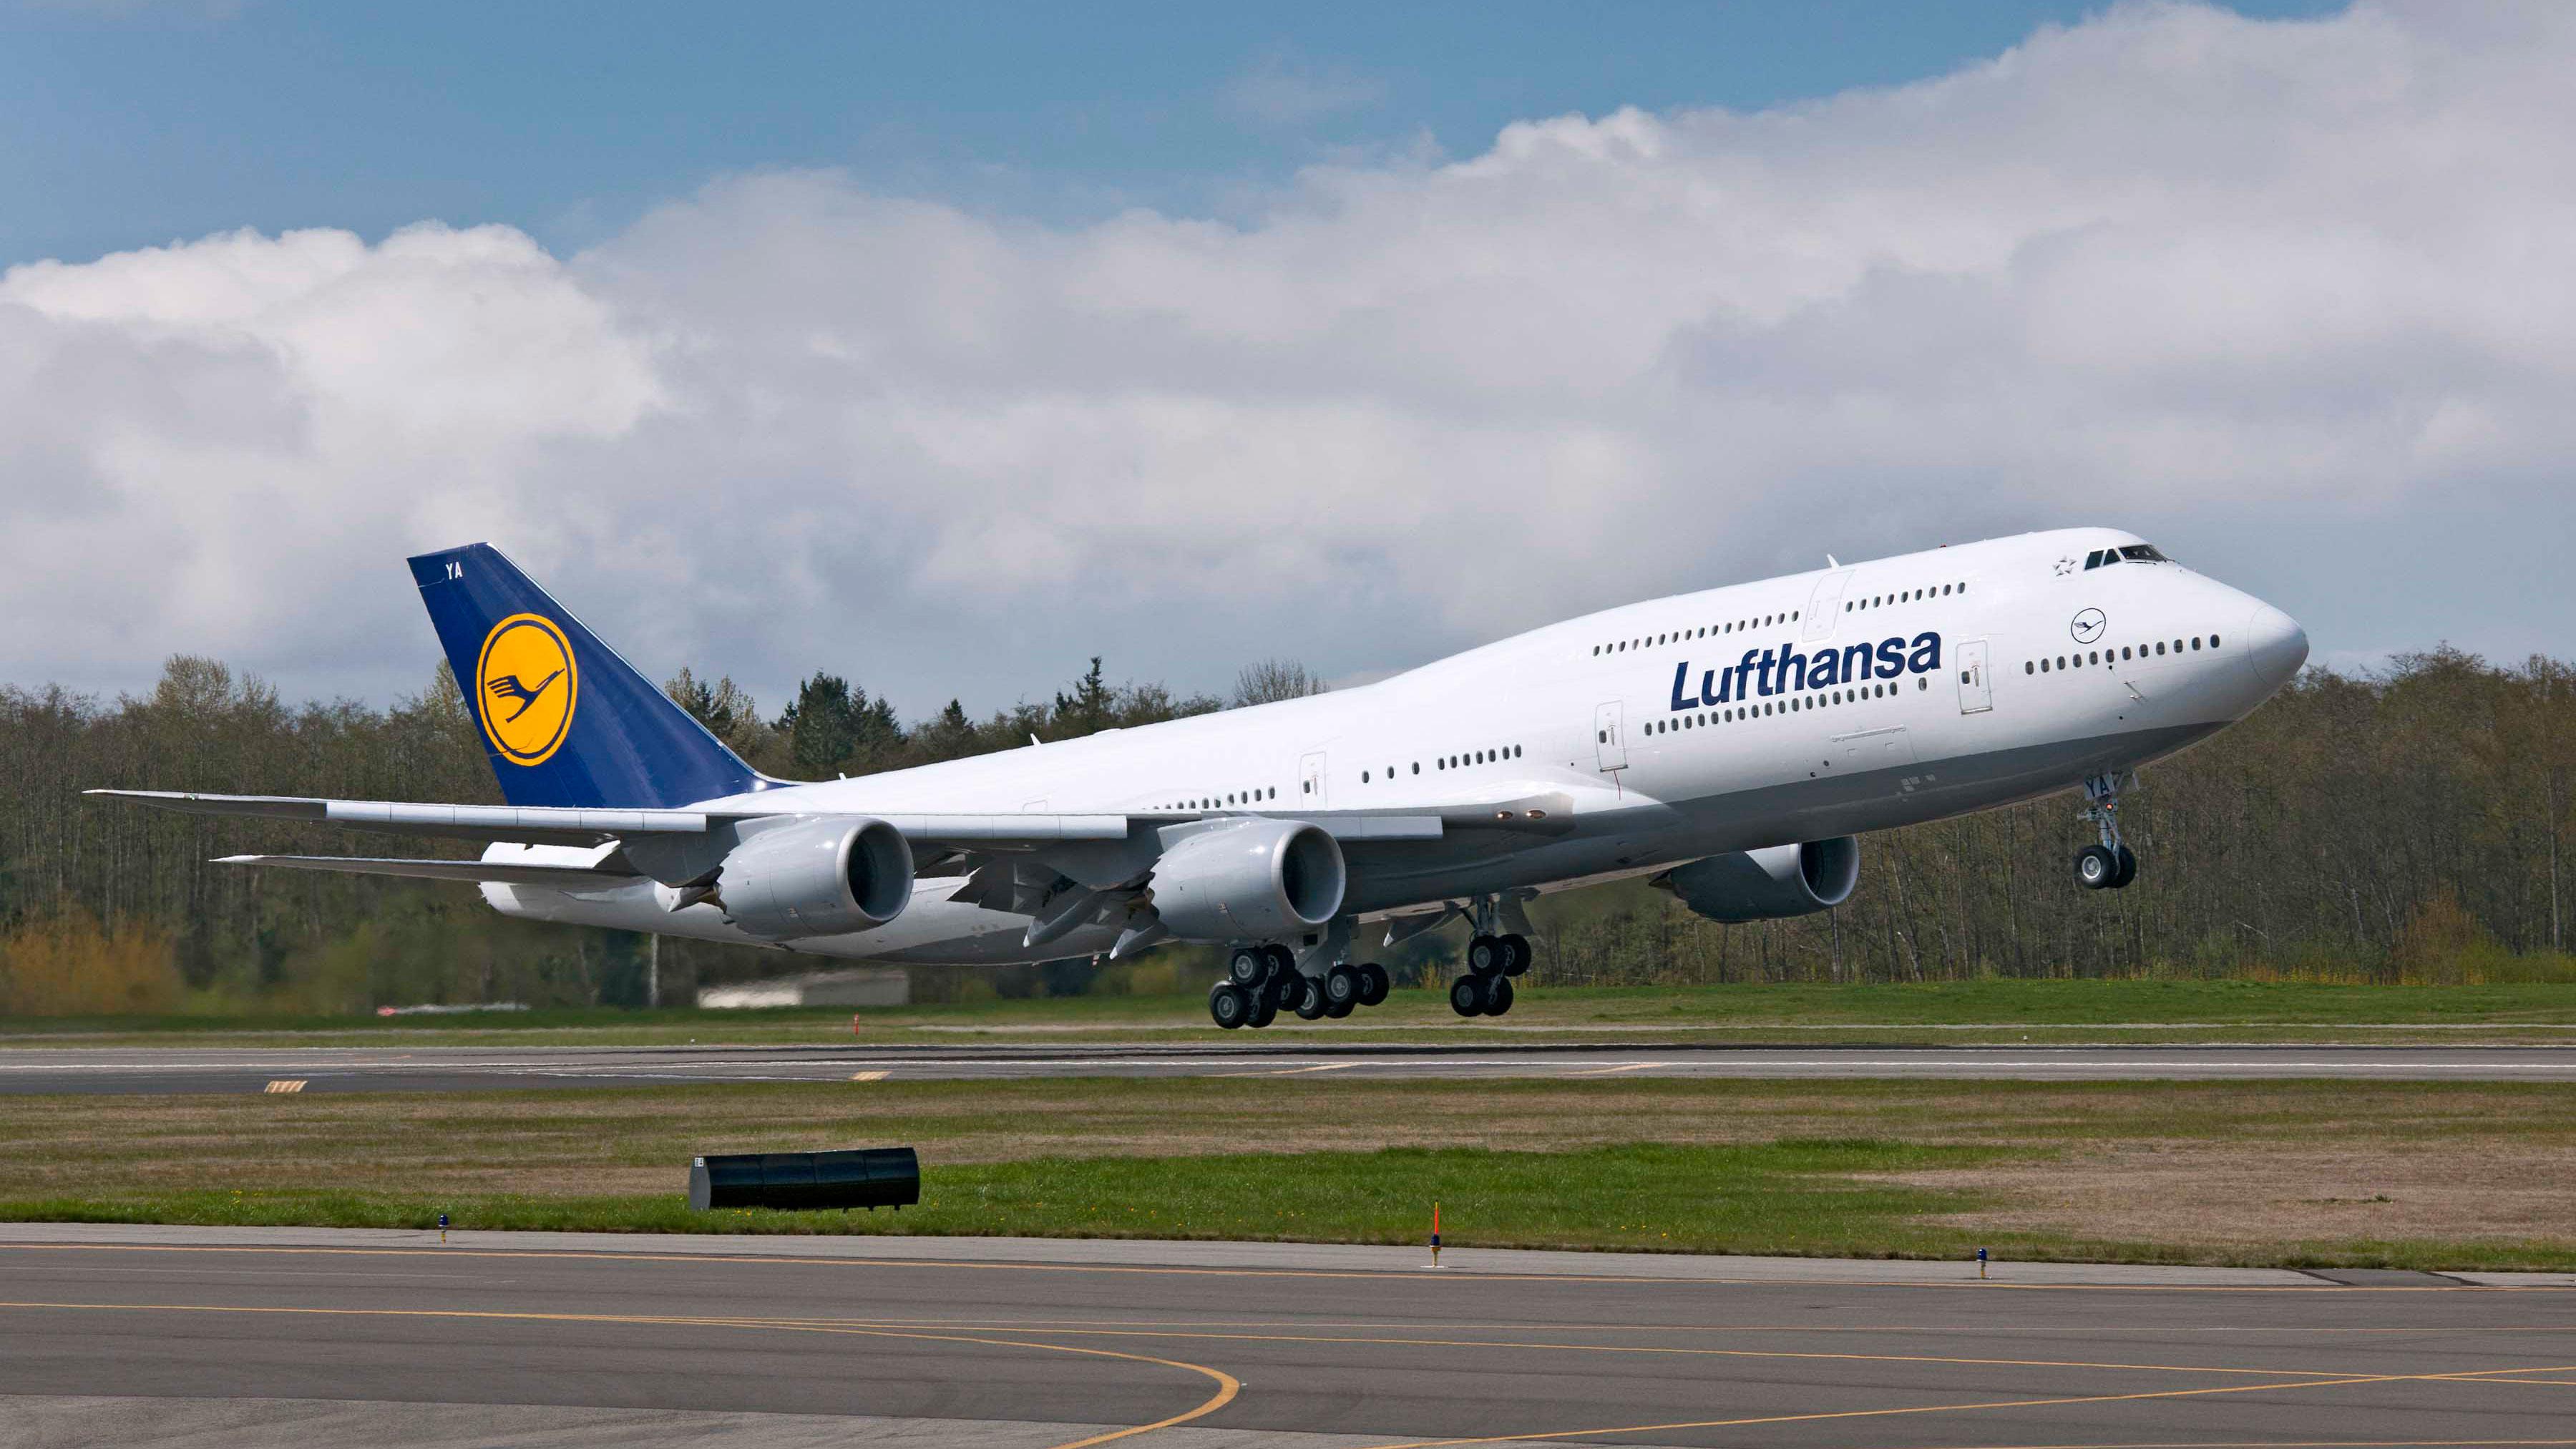 lufthansa sues passenger who